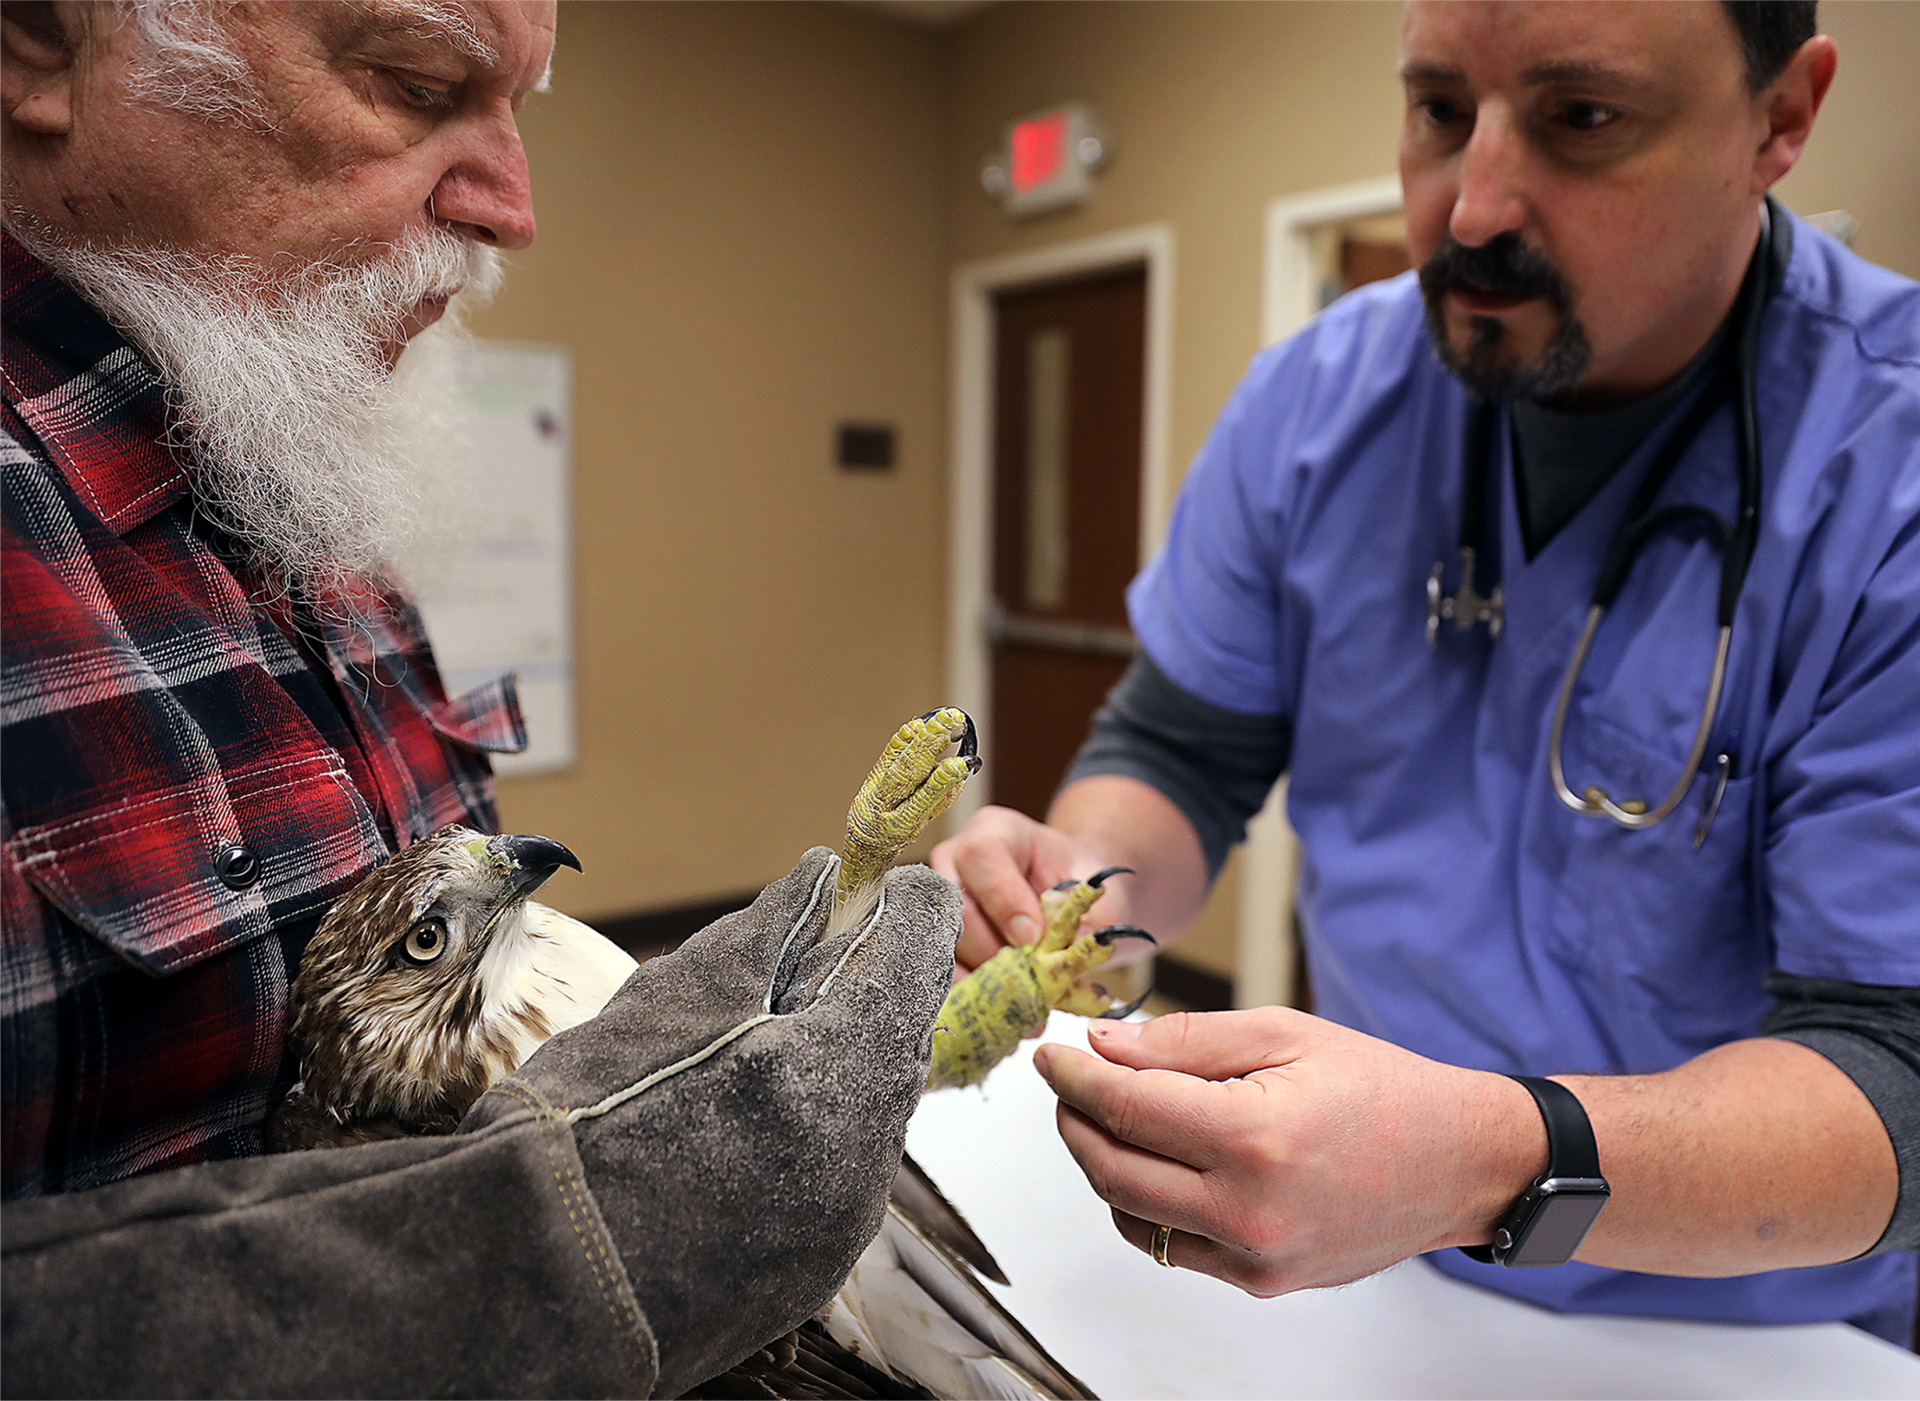 Rehabilitators play key role in helping to preserve wildlife